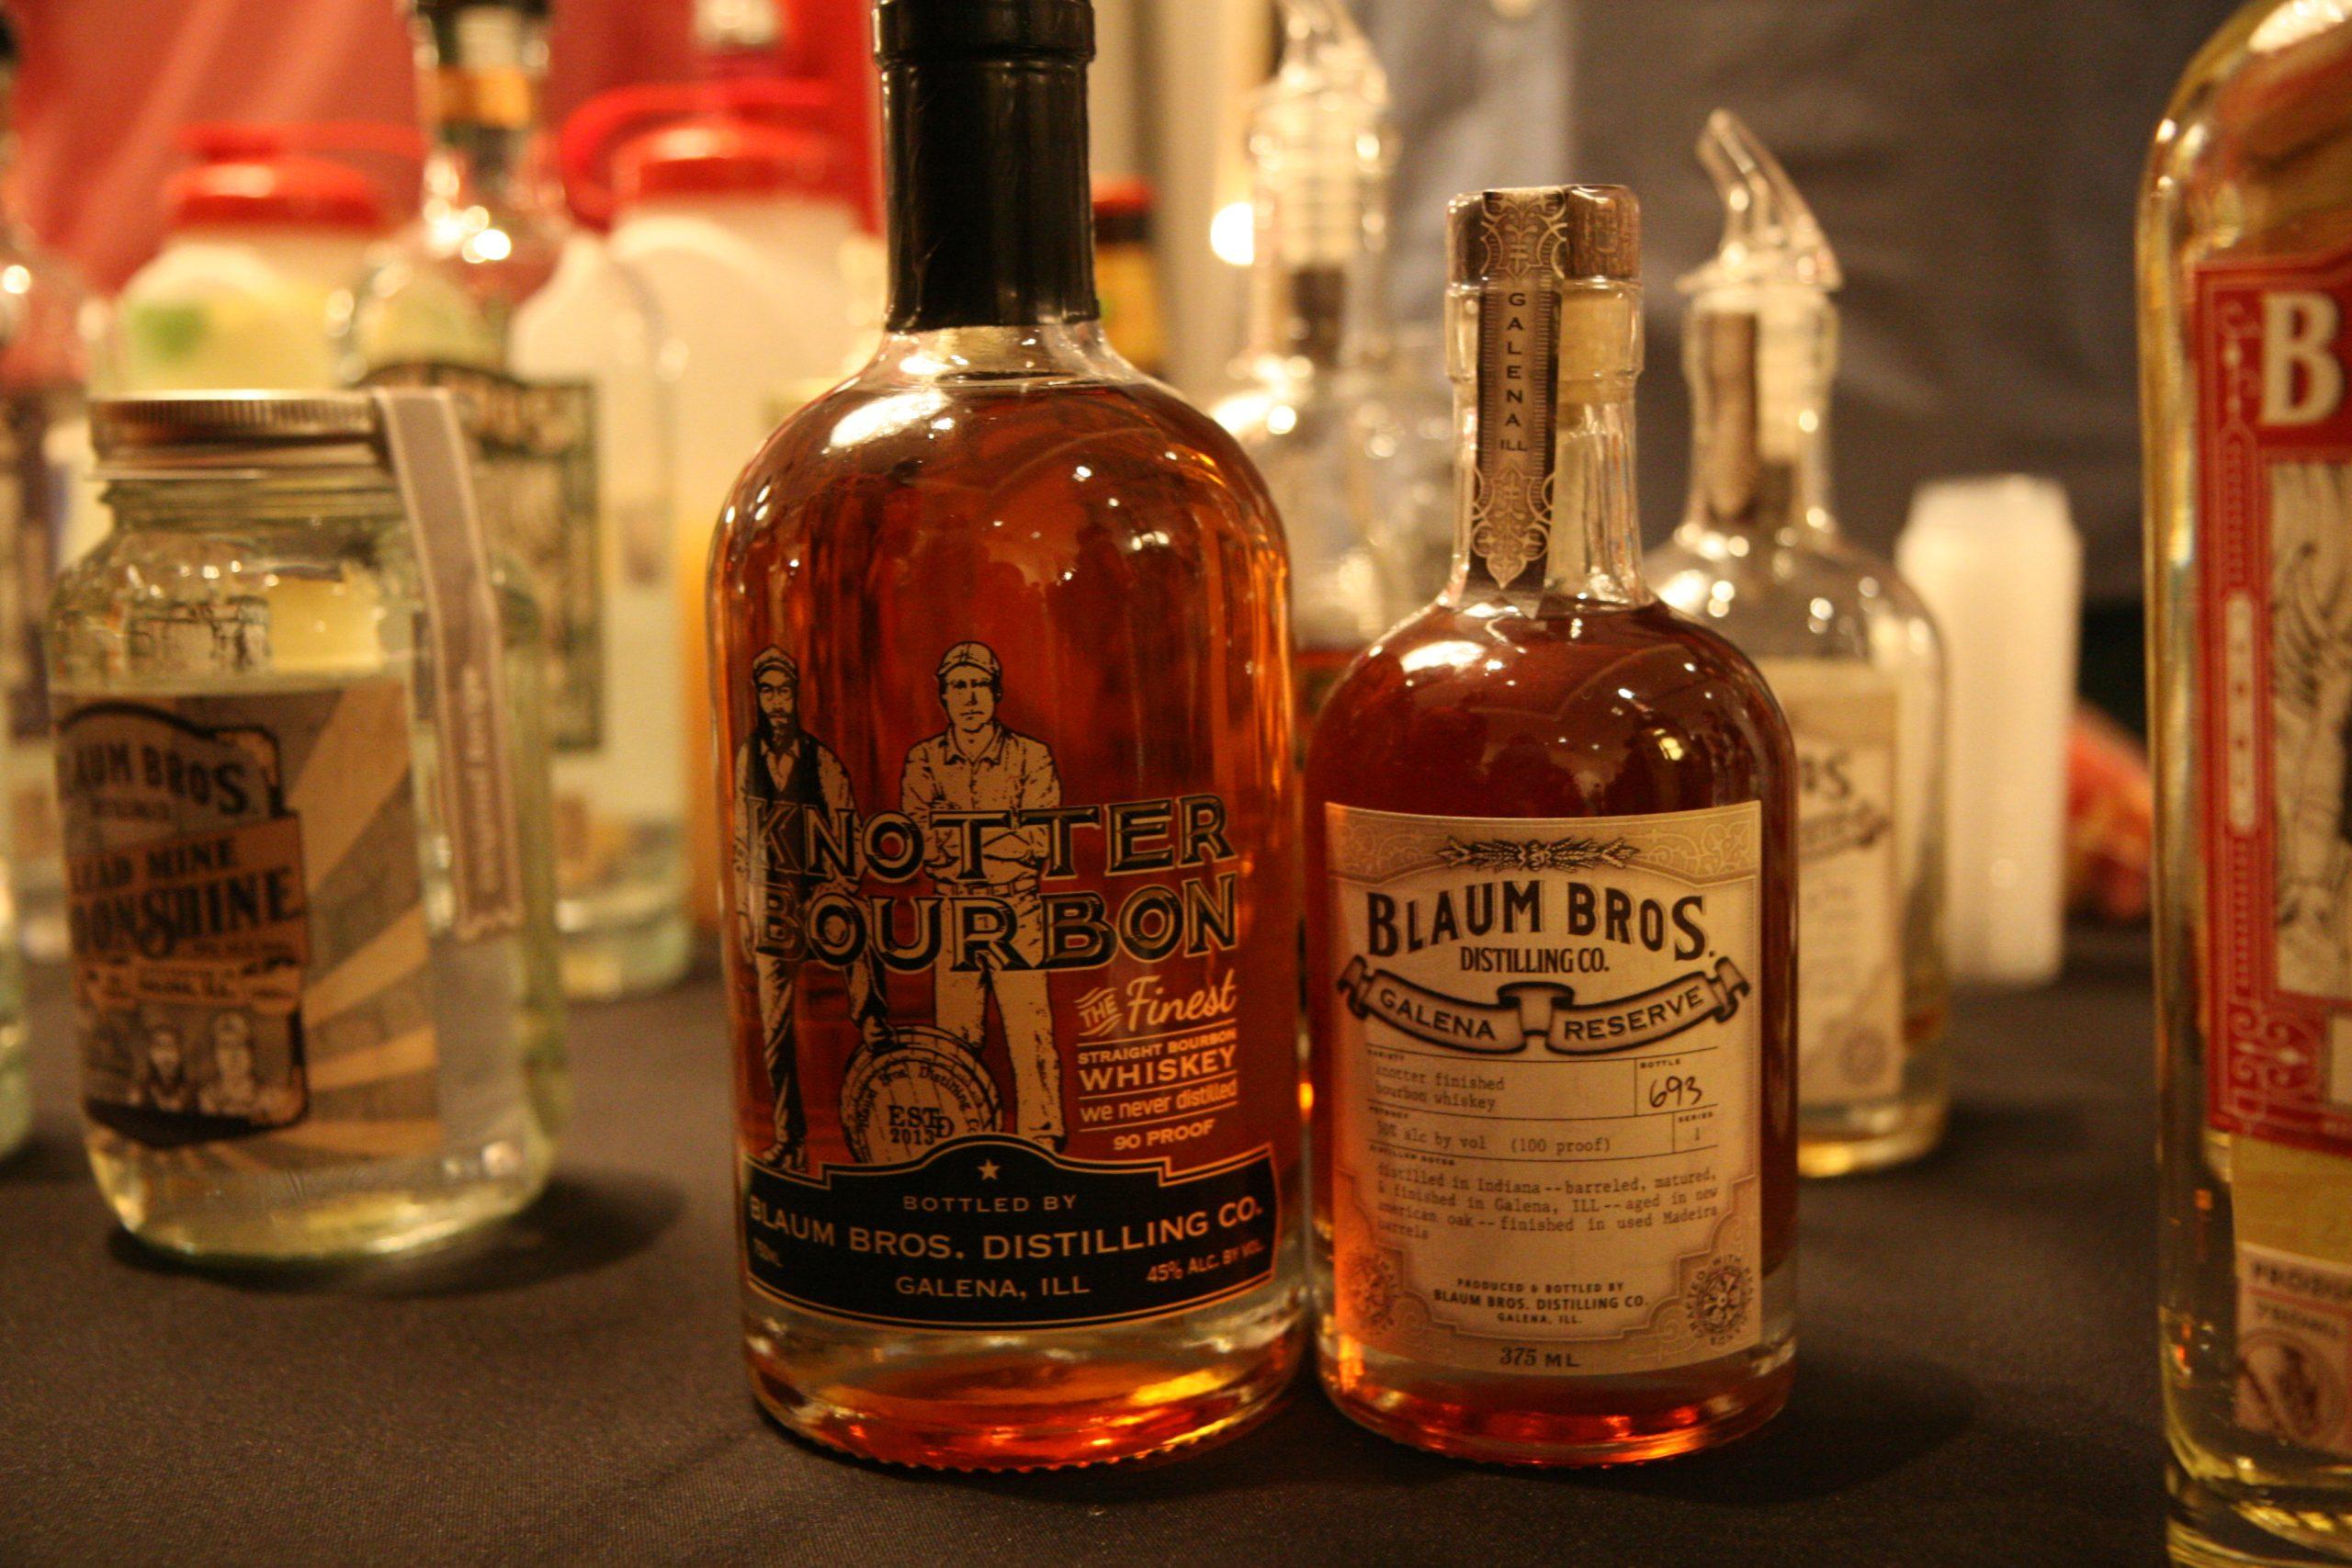 Knotter bourbon and Madeira-finished Knotter bourbon